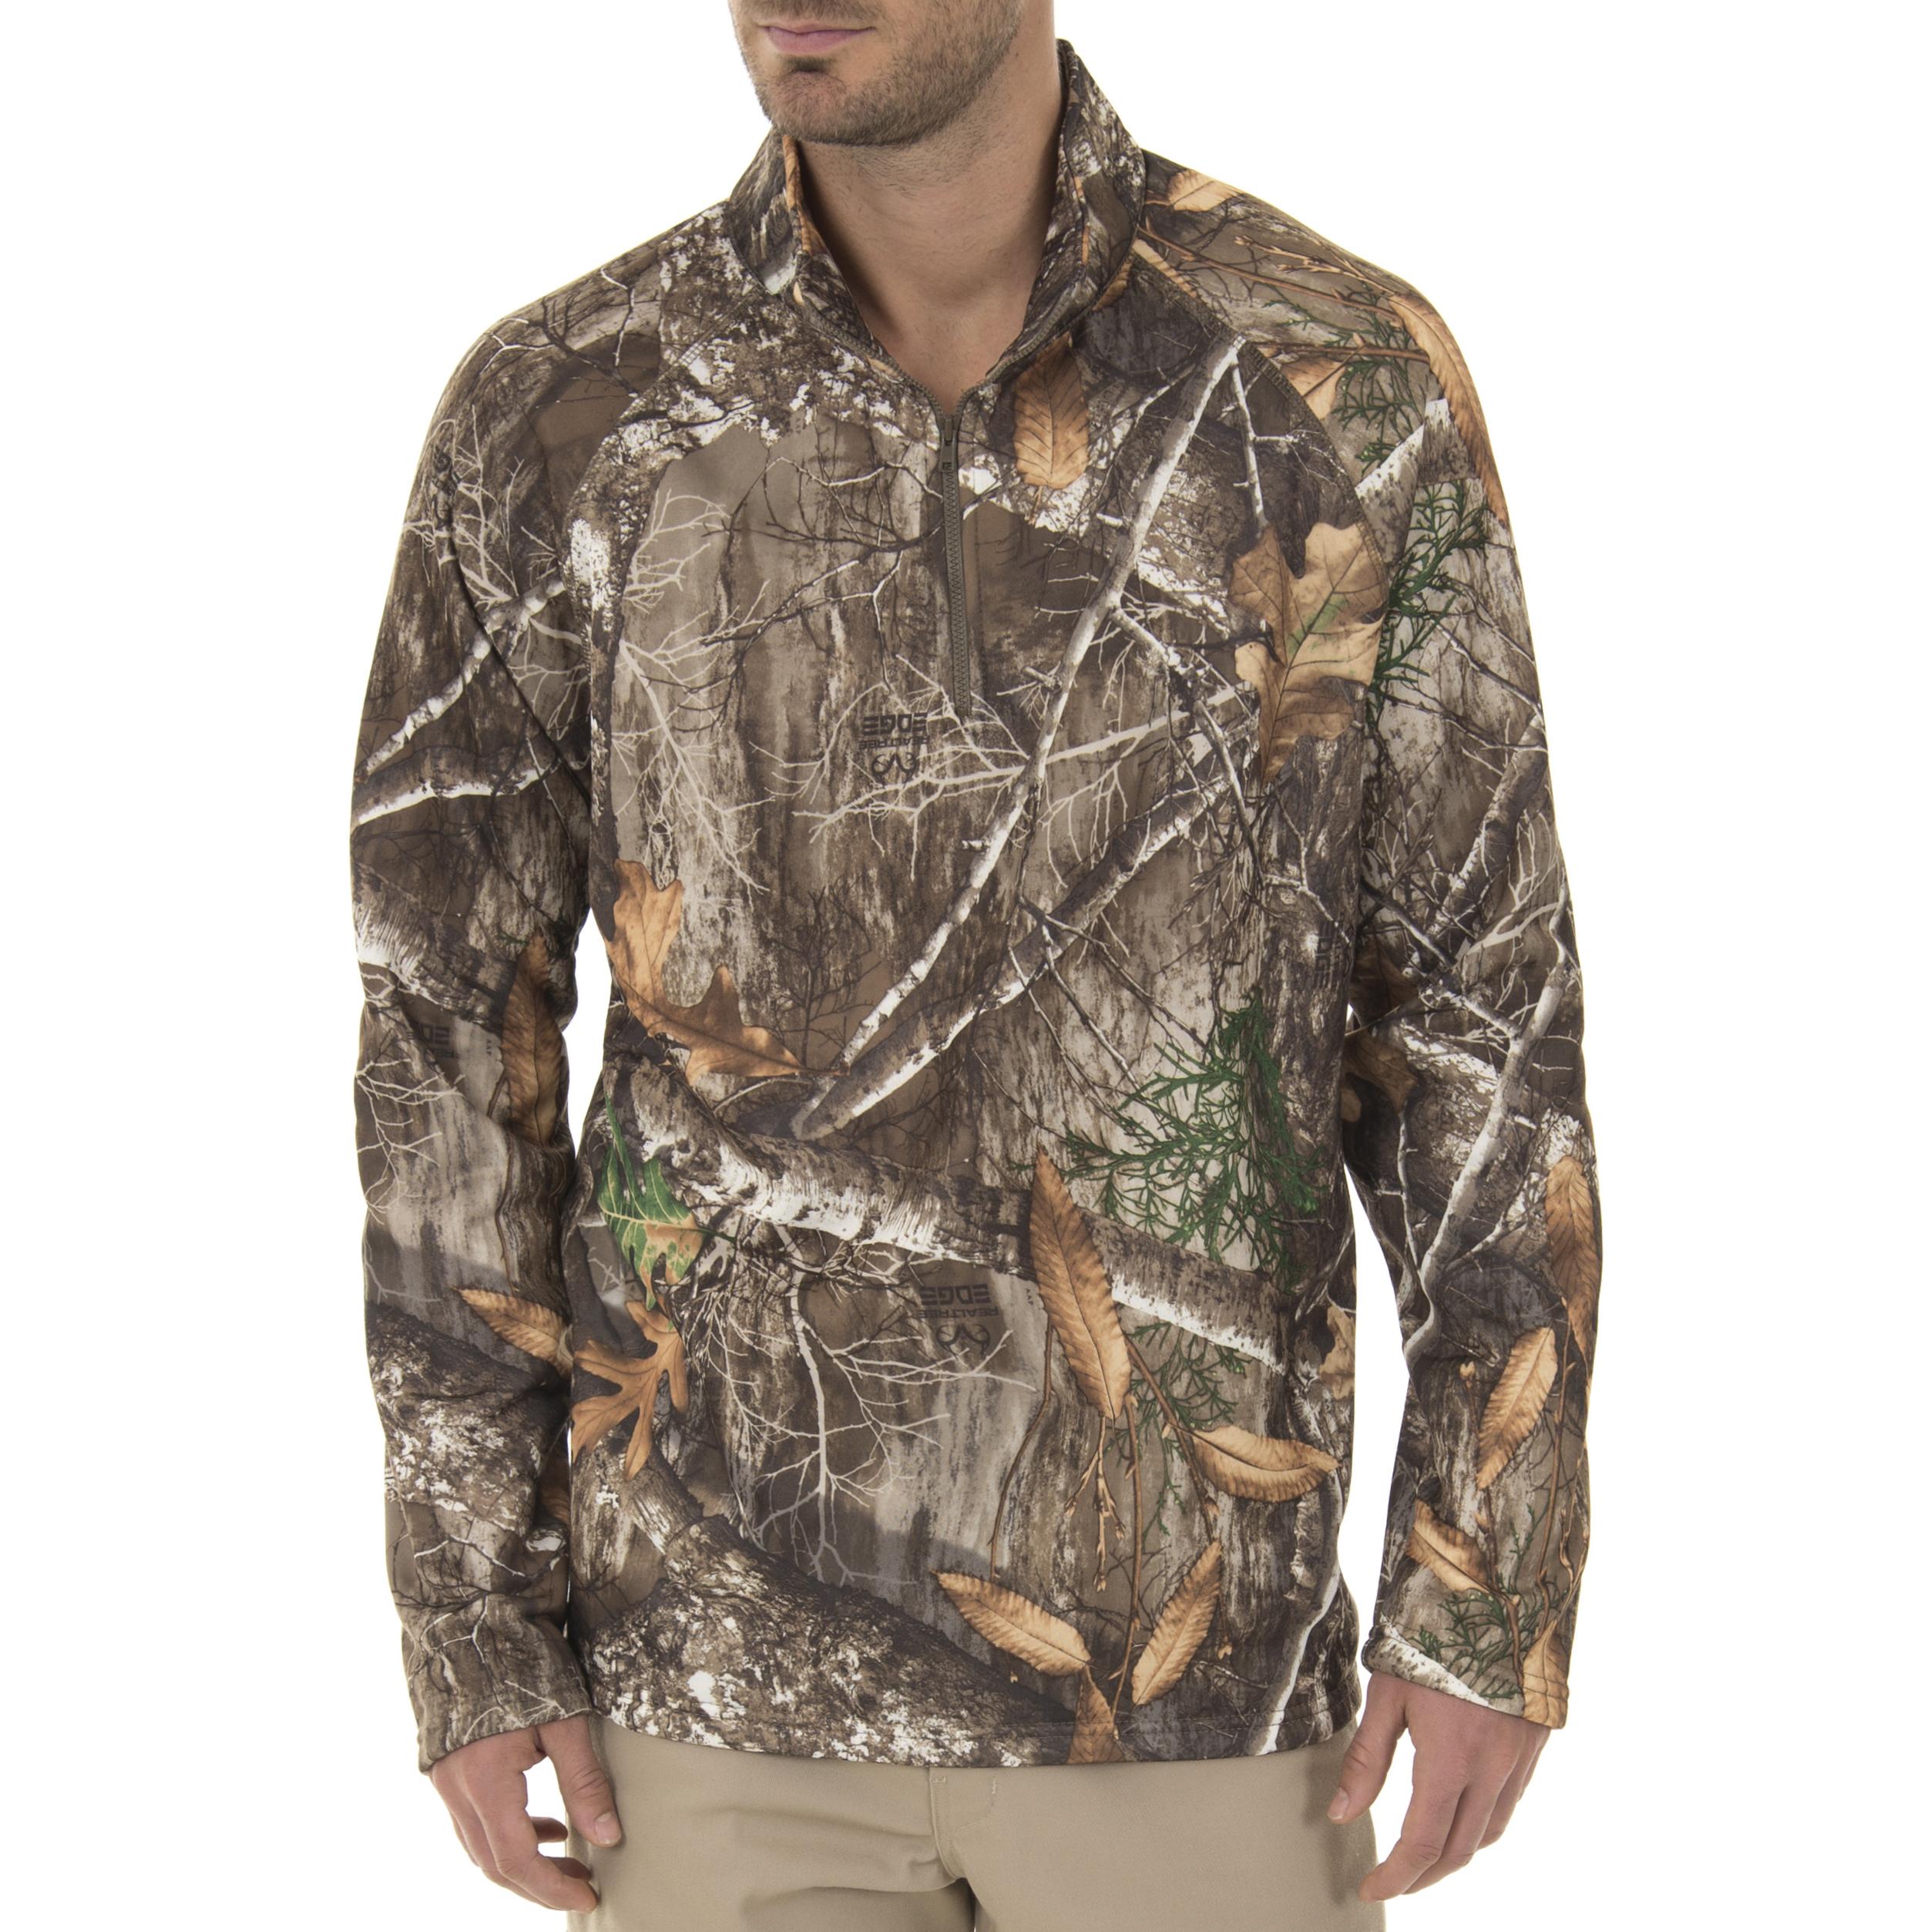 Realtree & Mossy Oak Men's Fleece Performance Camo 1/4 Zip Jacket